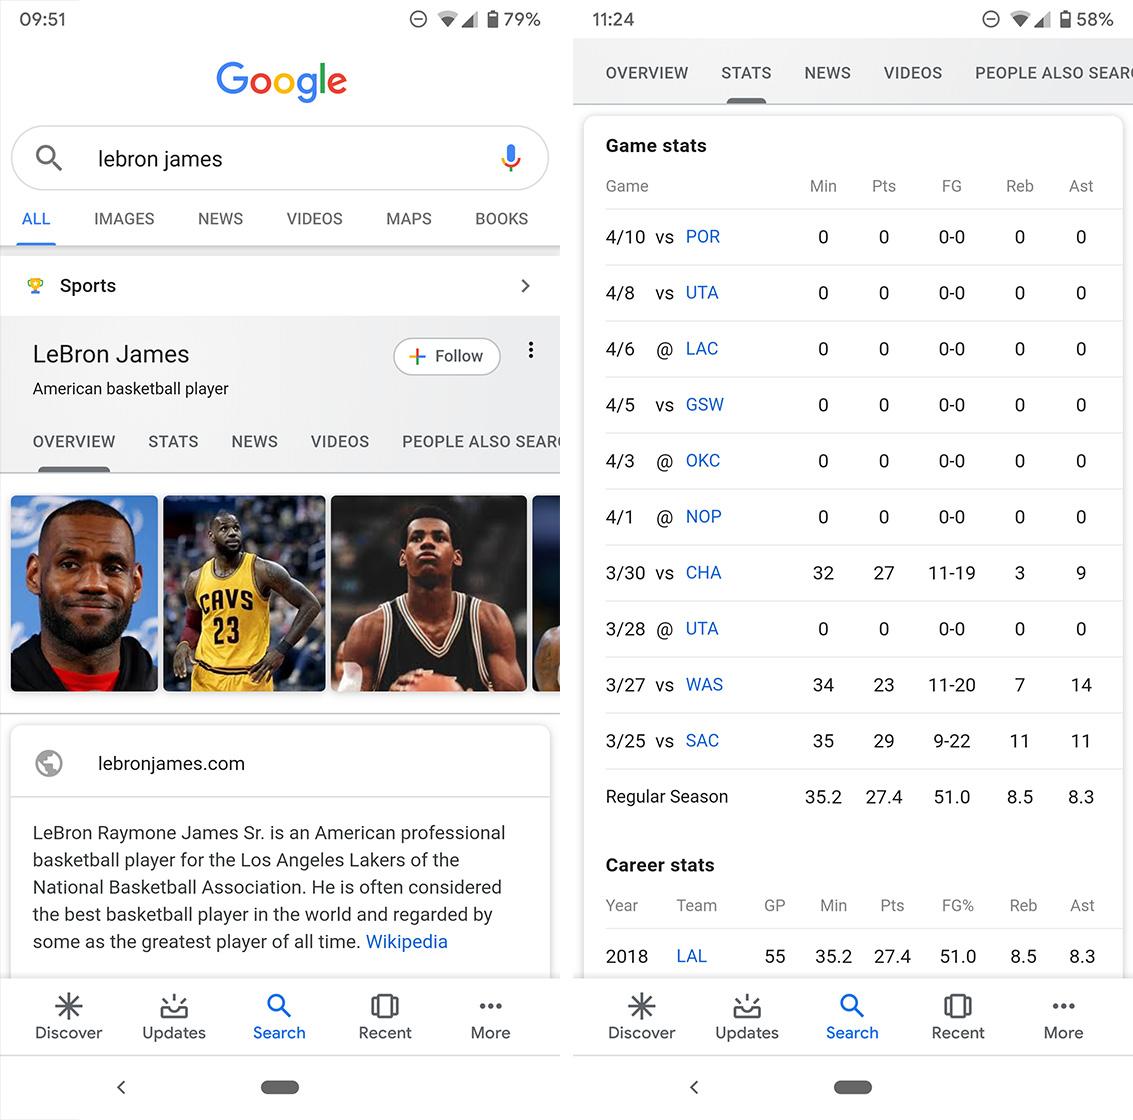 Google search athlete card